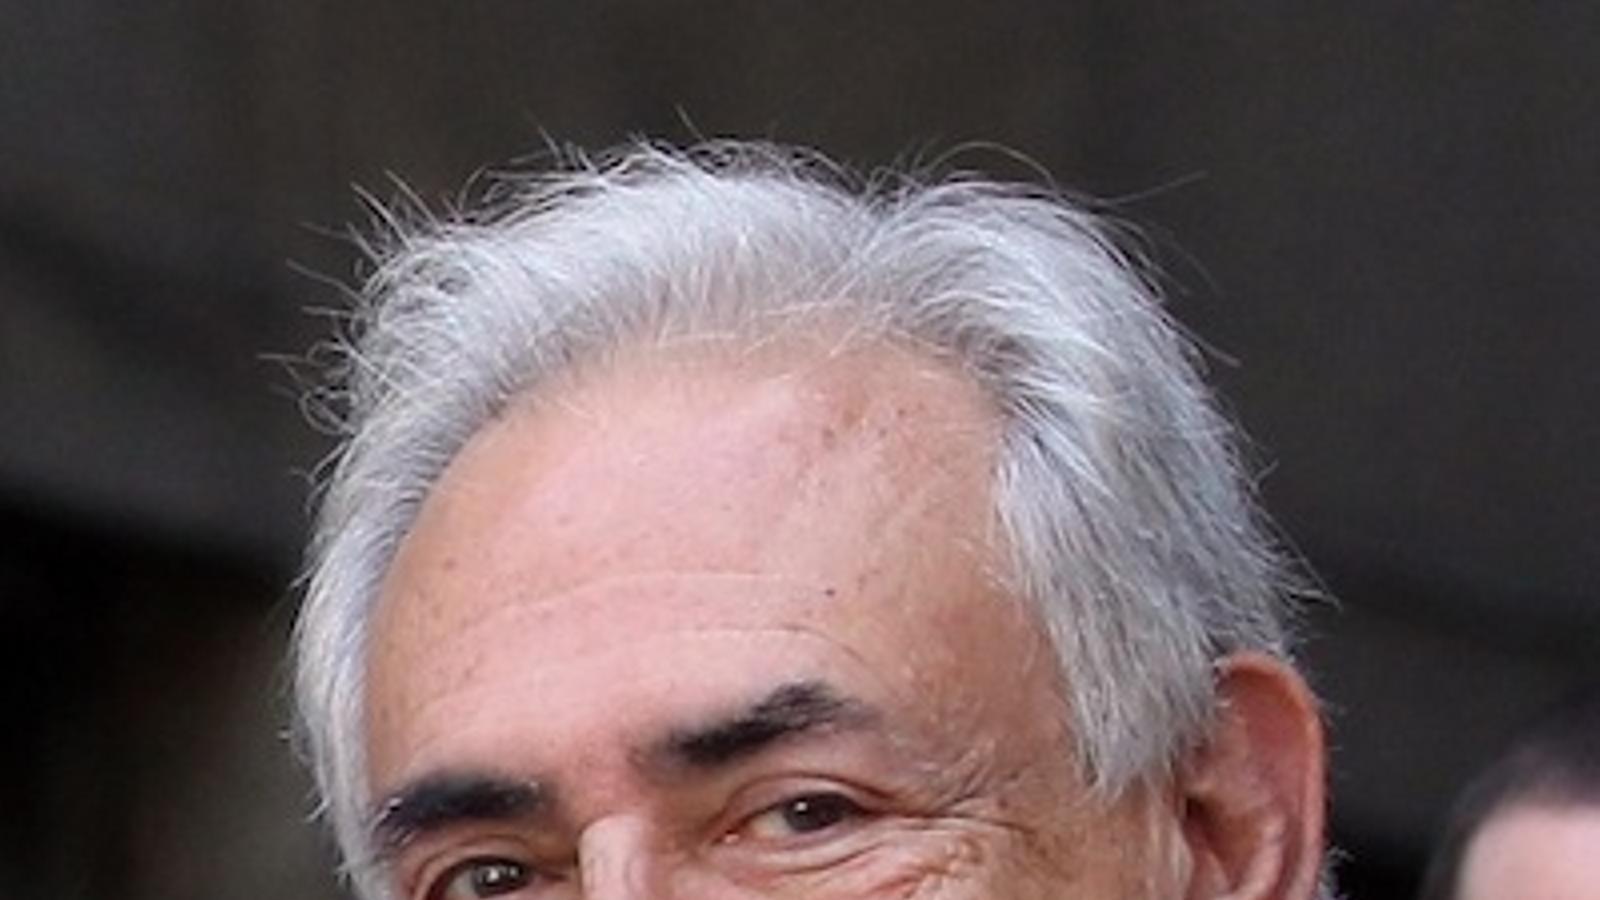 L'exdirector gerent de l'FMI i líder socialista, Dominique Strauss-Kahn